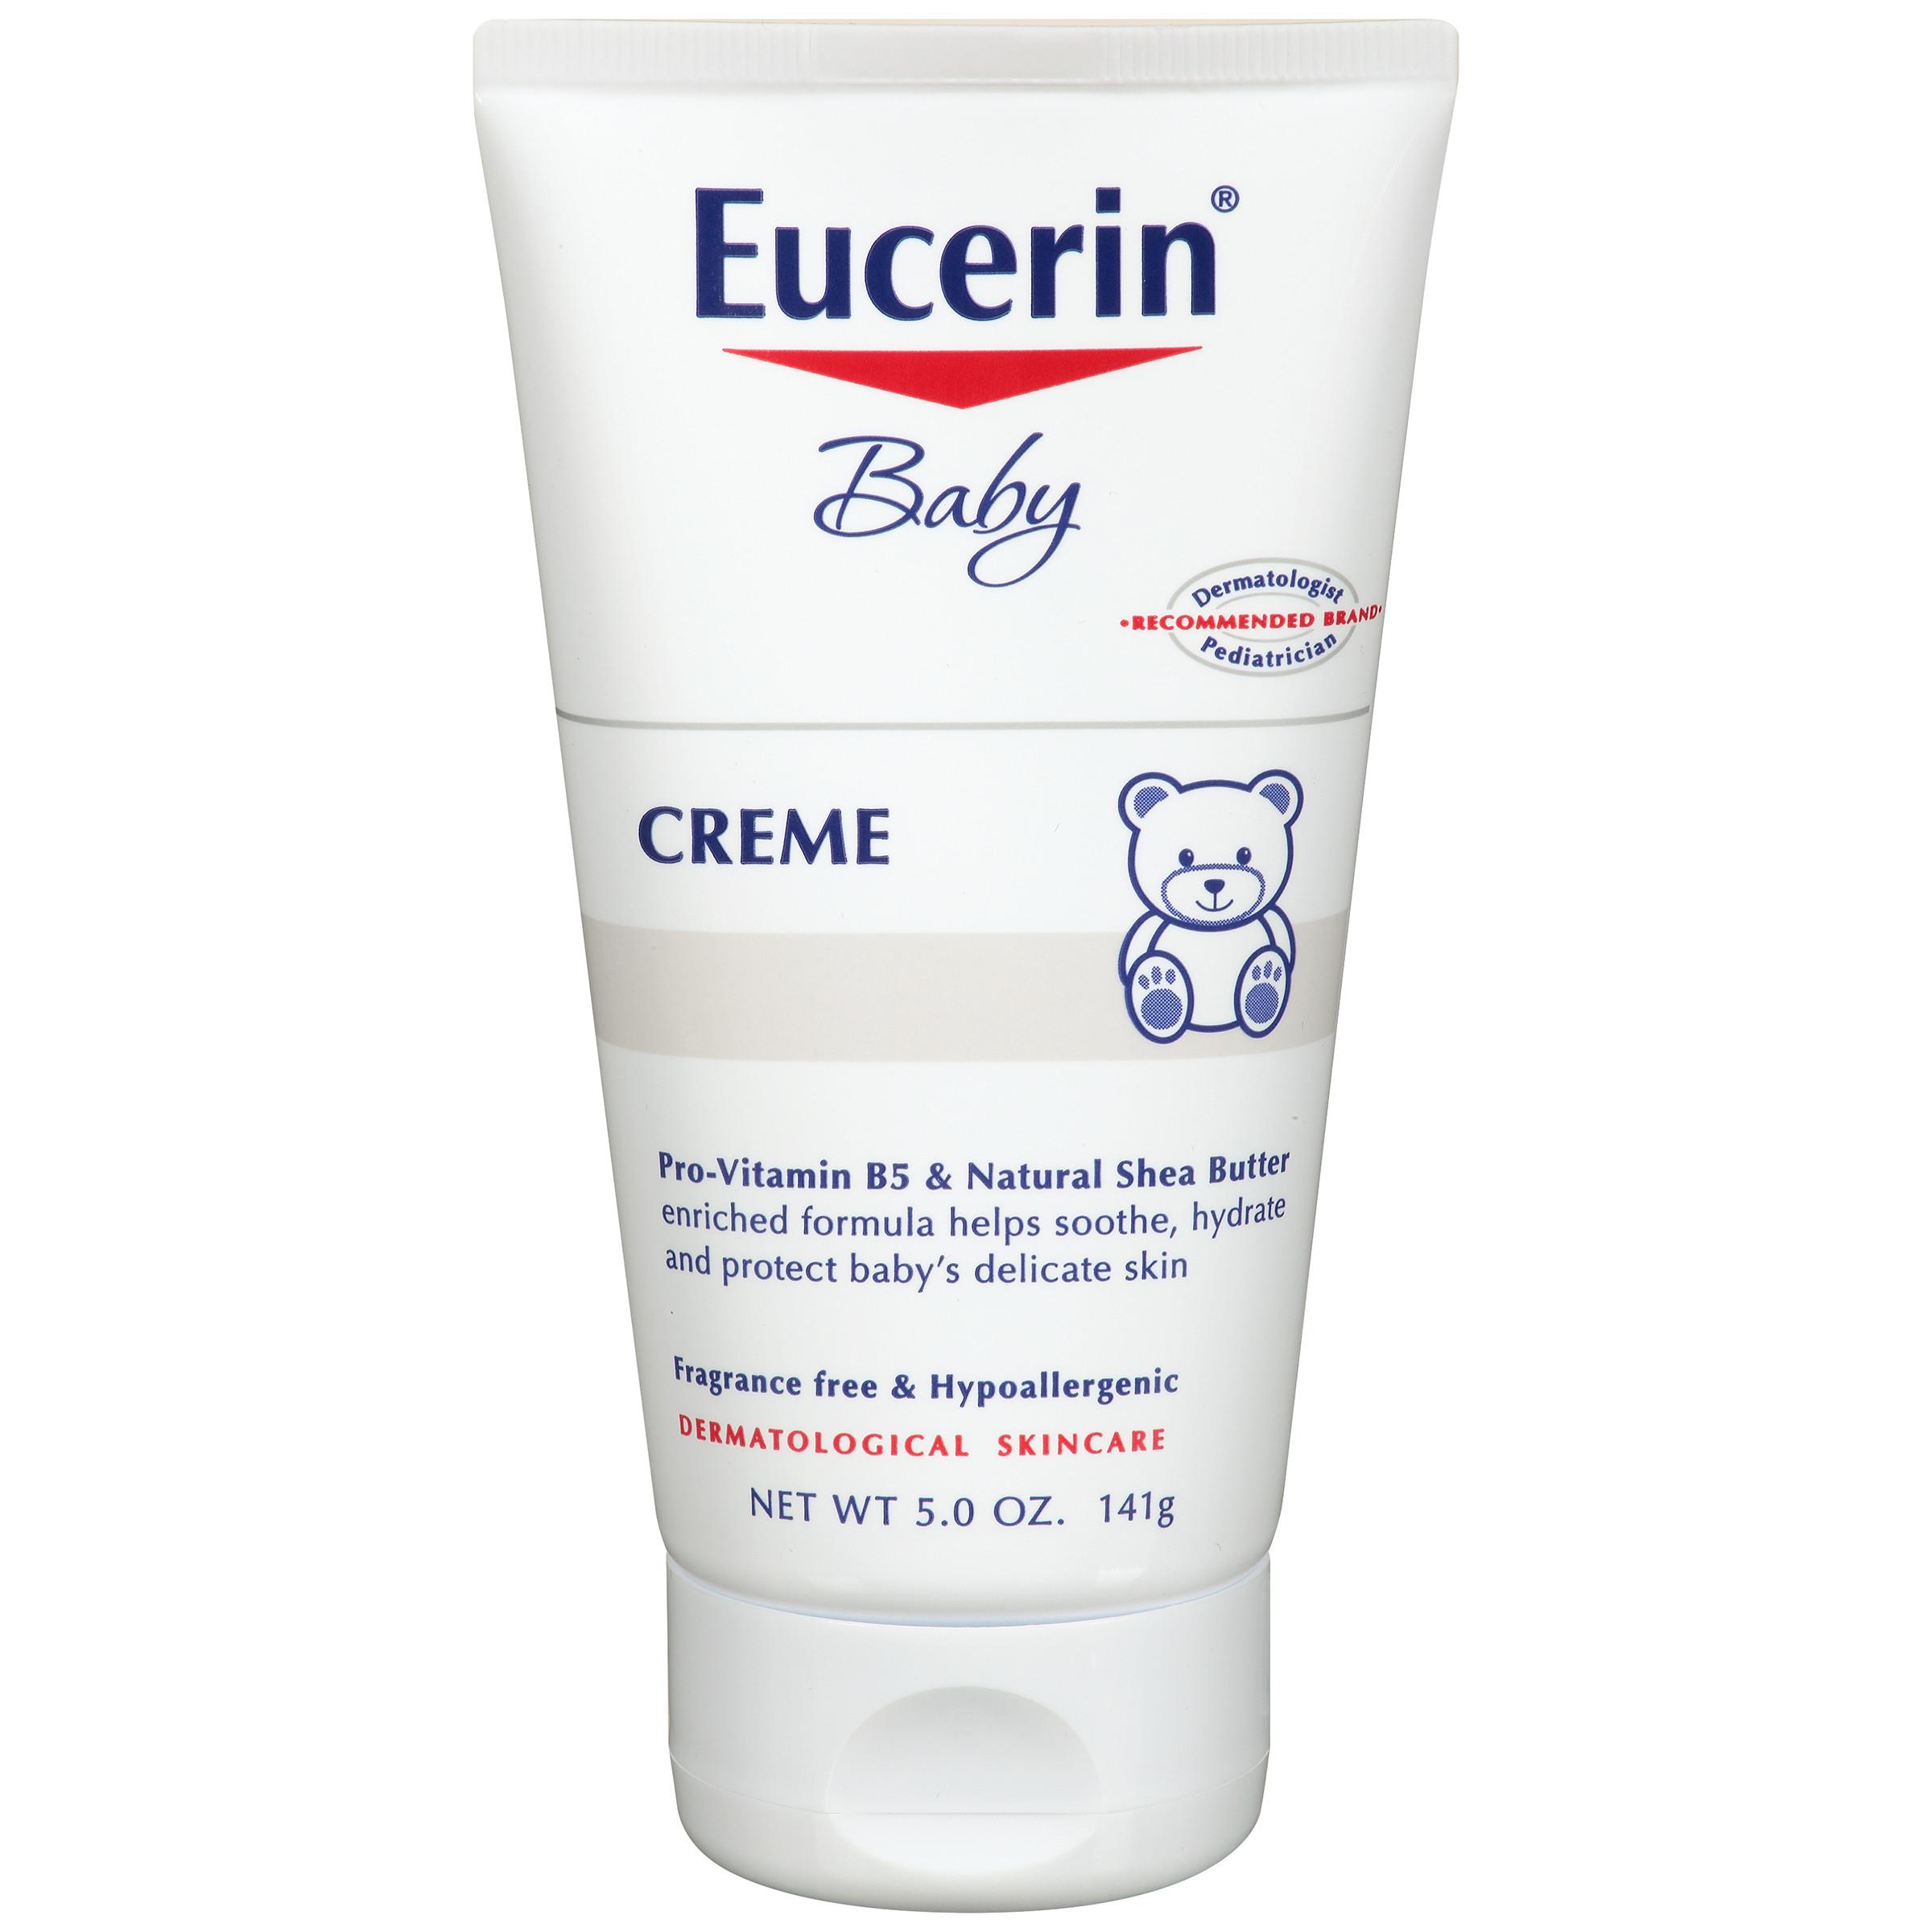 Eucerin Baby Creme 5 oz.